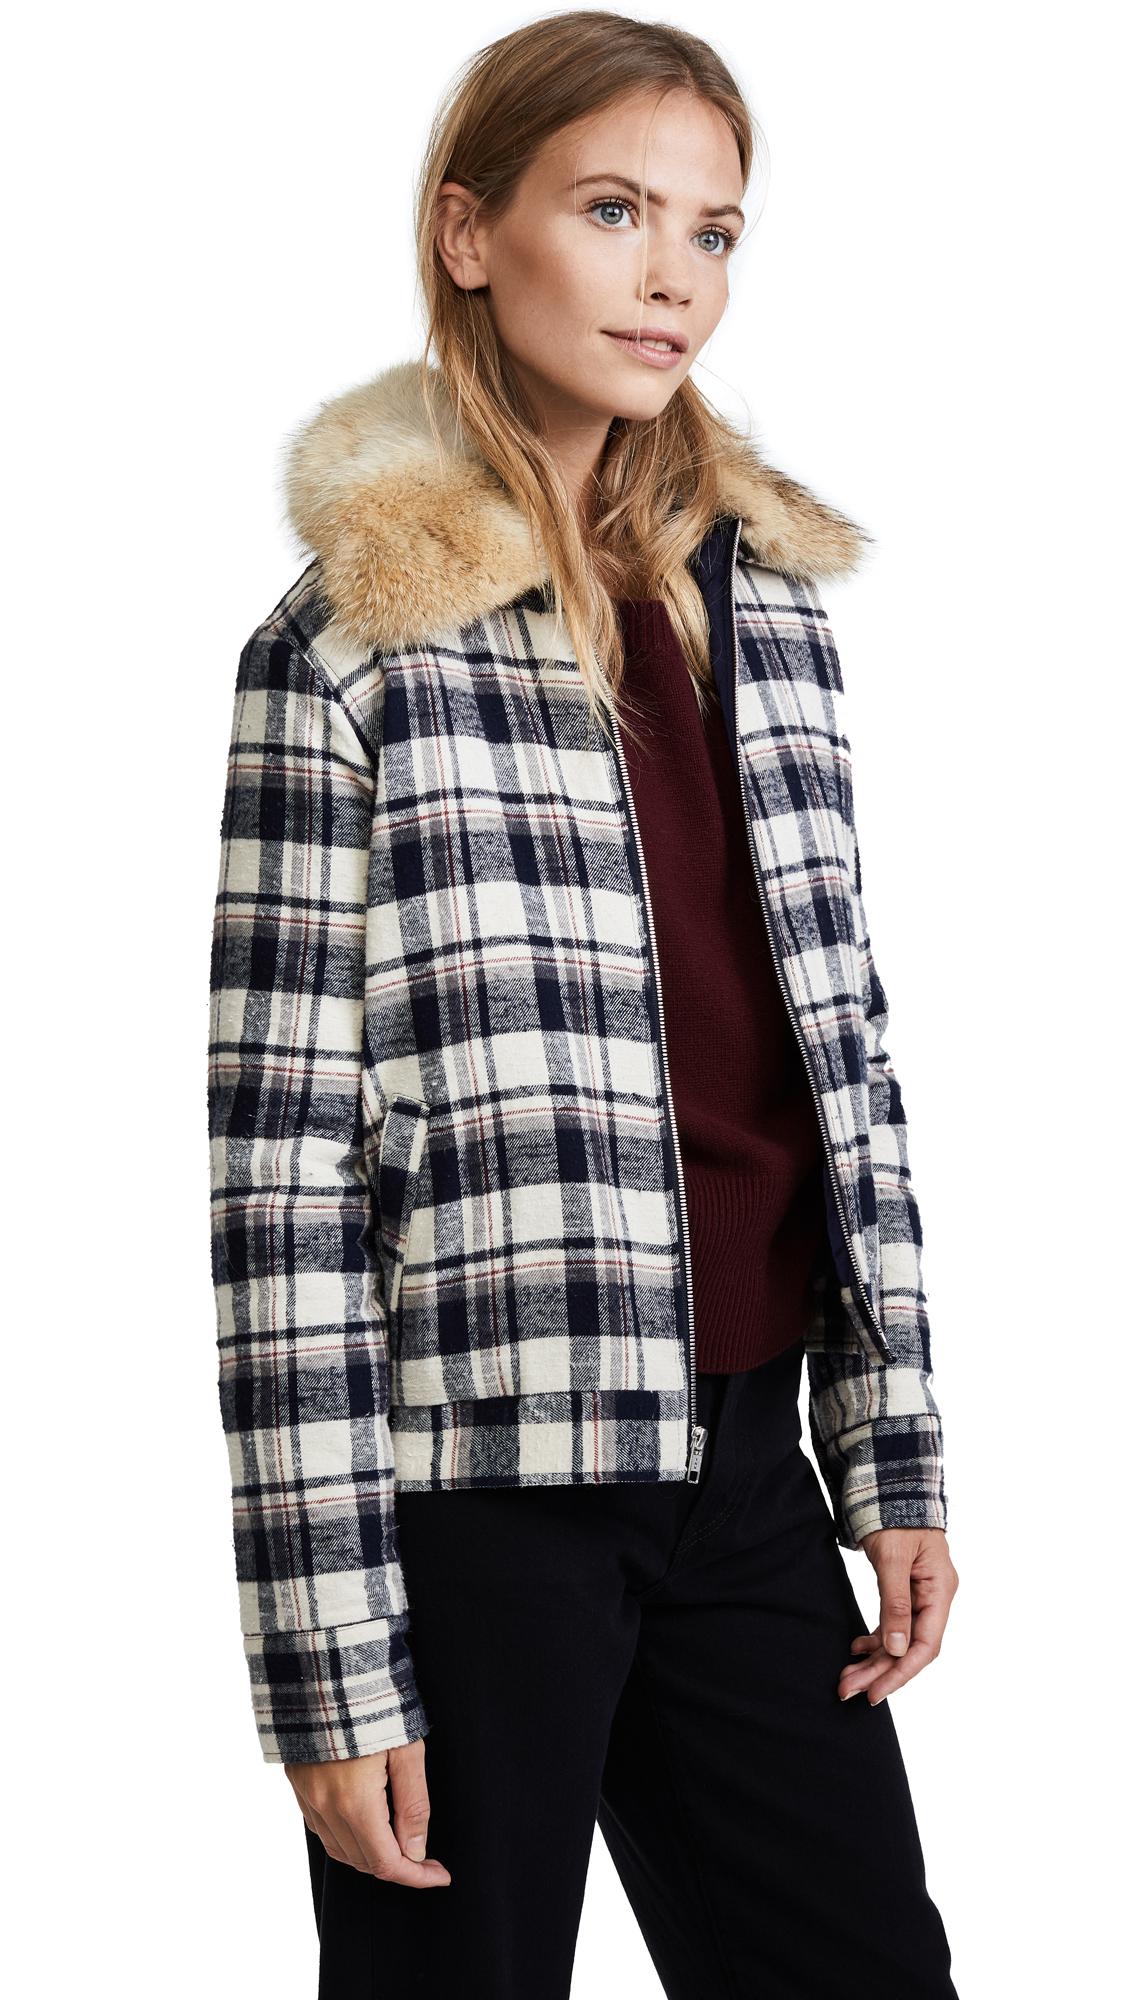 Jenni Kayne Fur Flannel Zip Jacket - Navy/Ivory/Burgundy